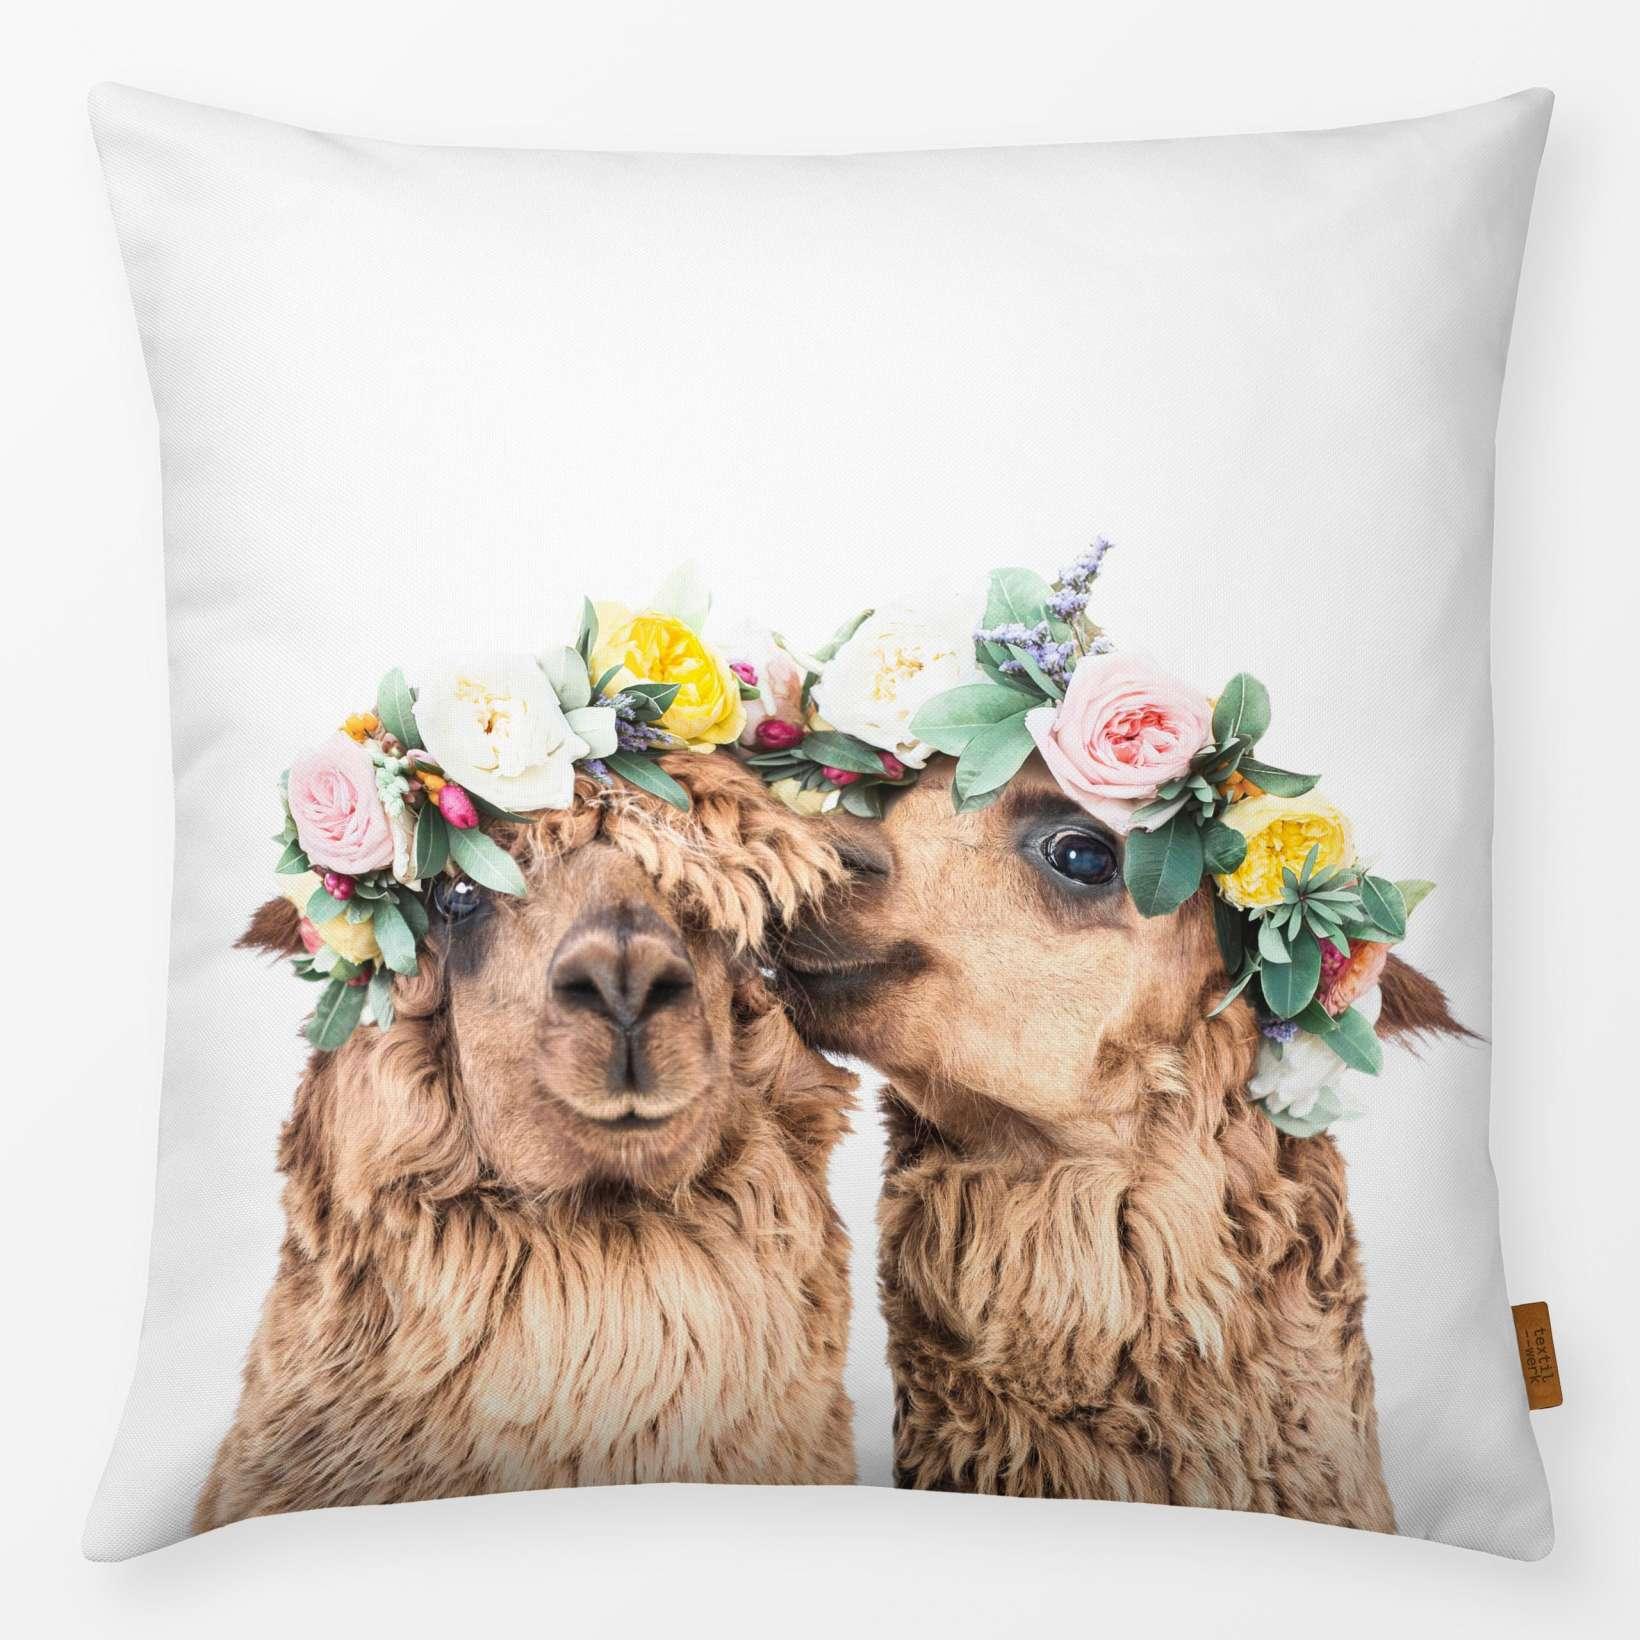 Kissen Alpacas with Corollas 40x40cm